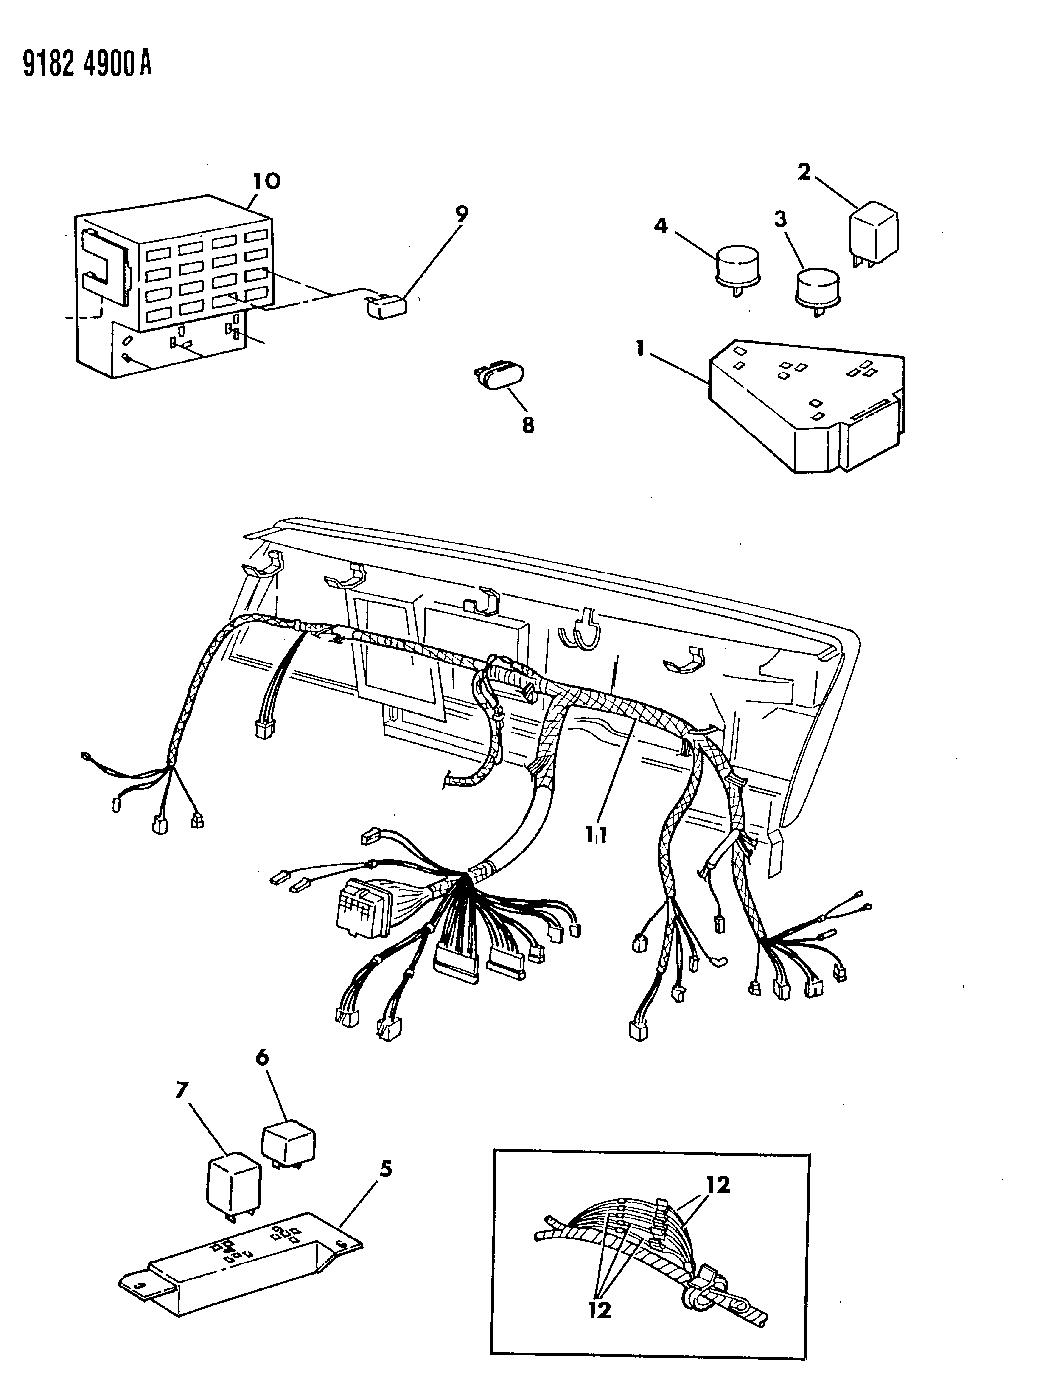 1989 Dodge Dynasty Instrument Panel Wiring